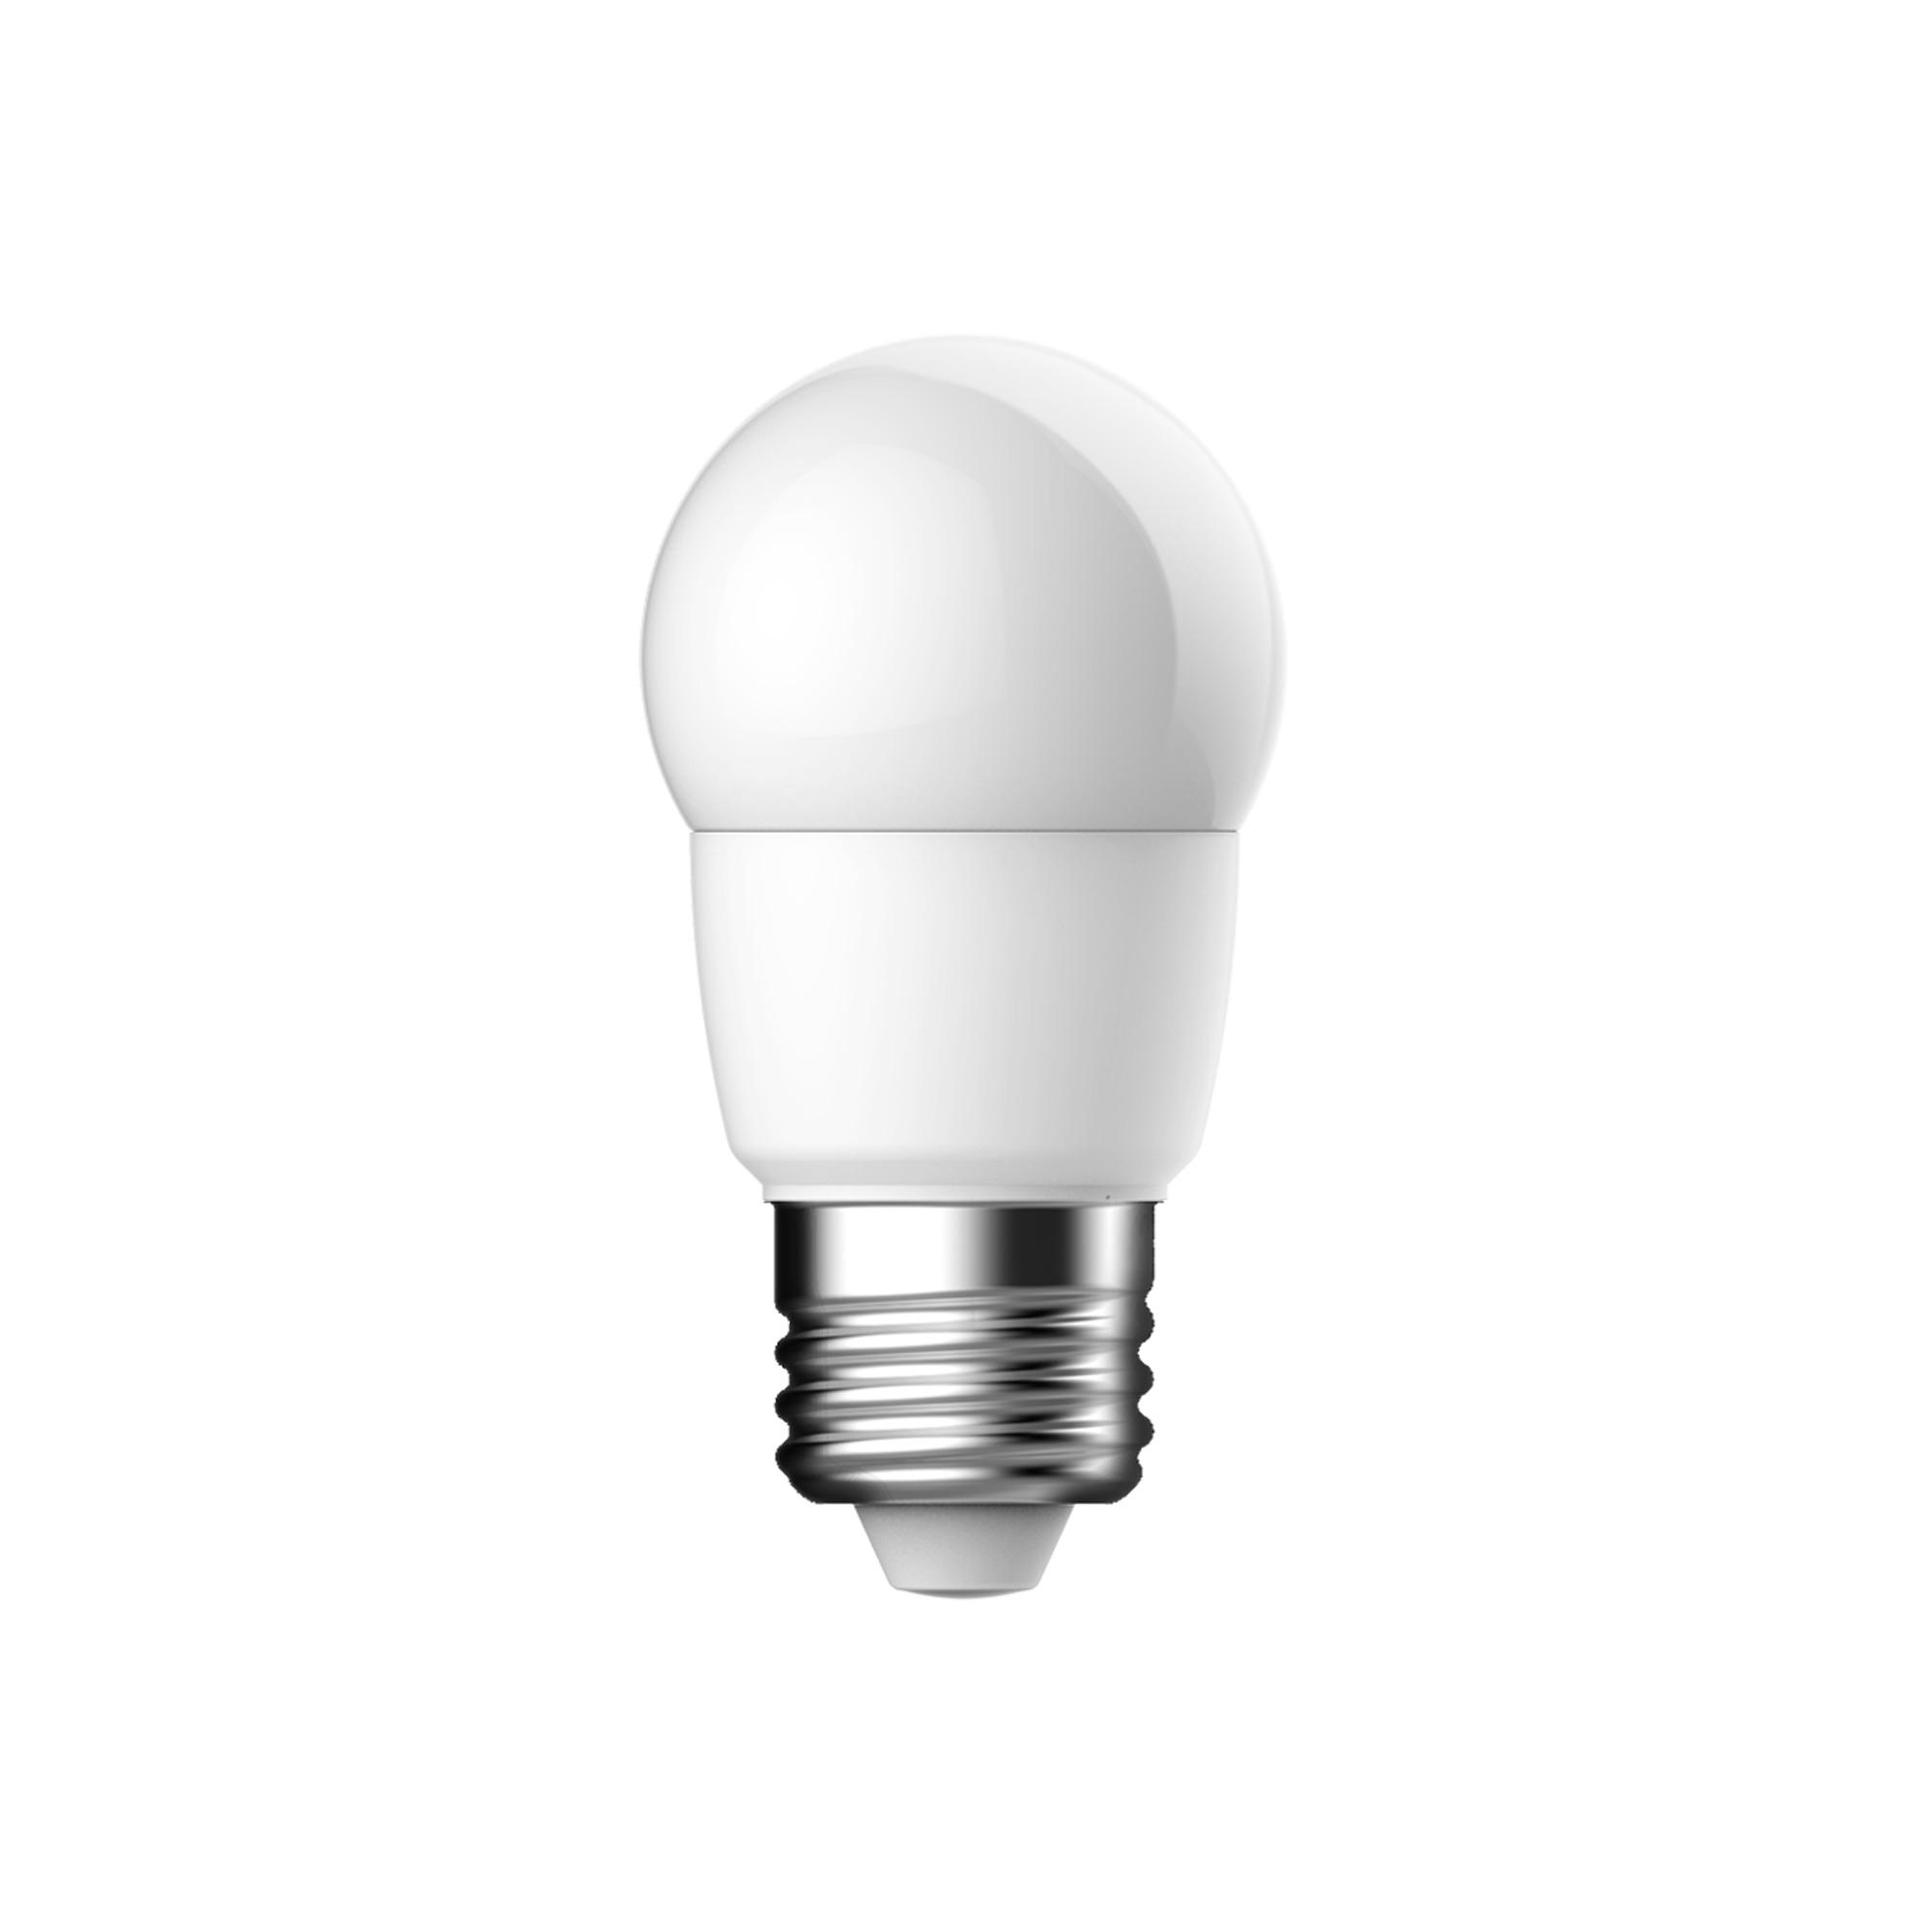 handson led kogellamp e27 140 lumen 2 5w 15w mat alle lampen lampen verlichting. Black Bedroom Furniture Sets. Home Design Ideas